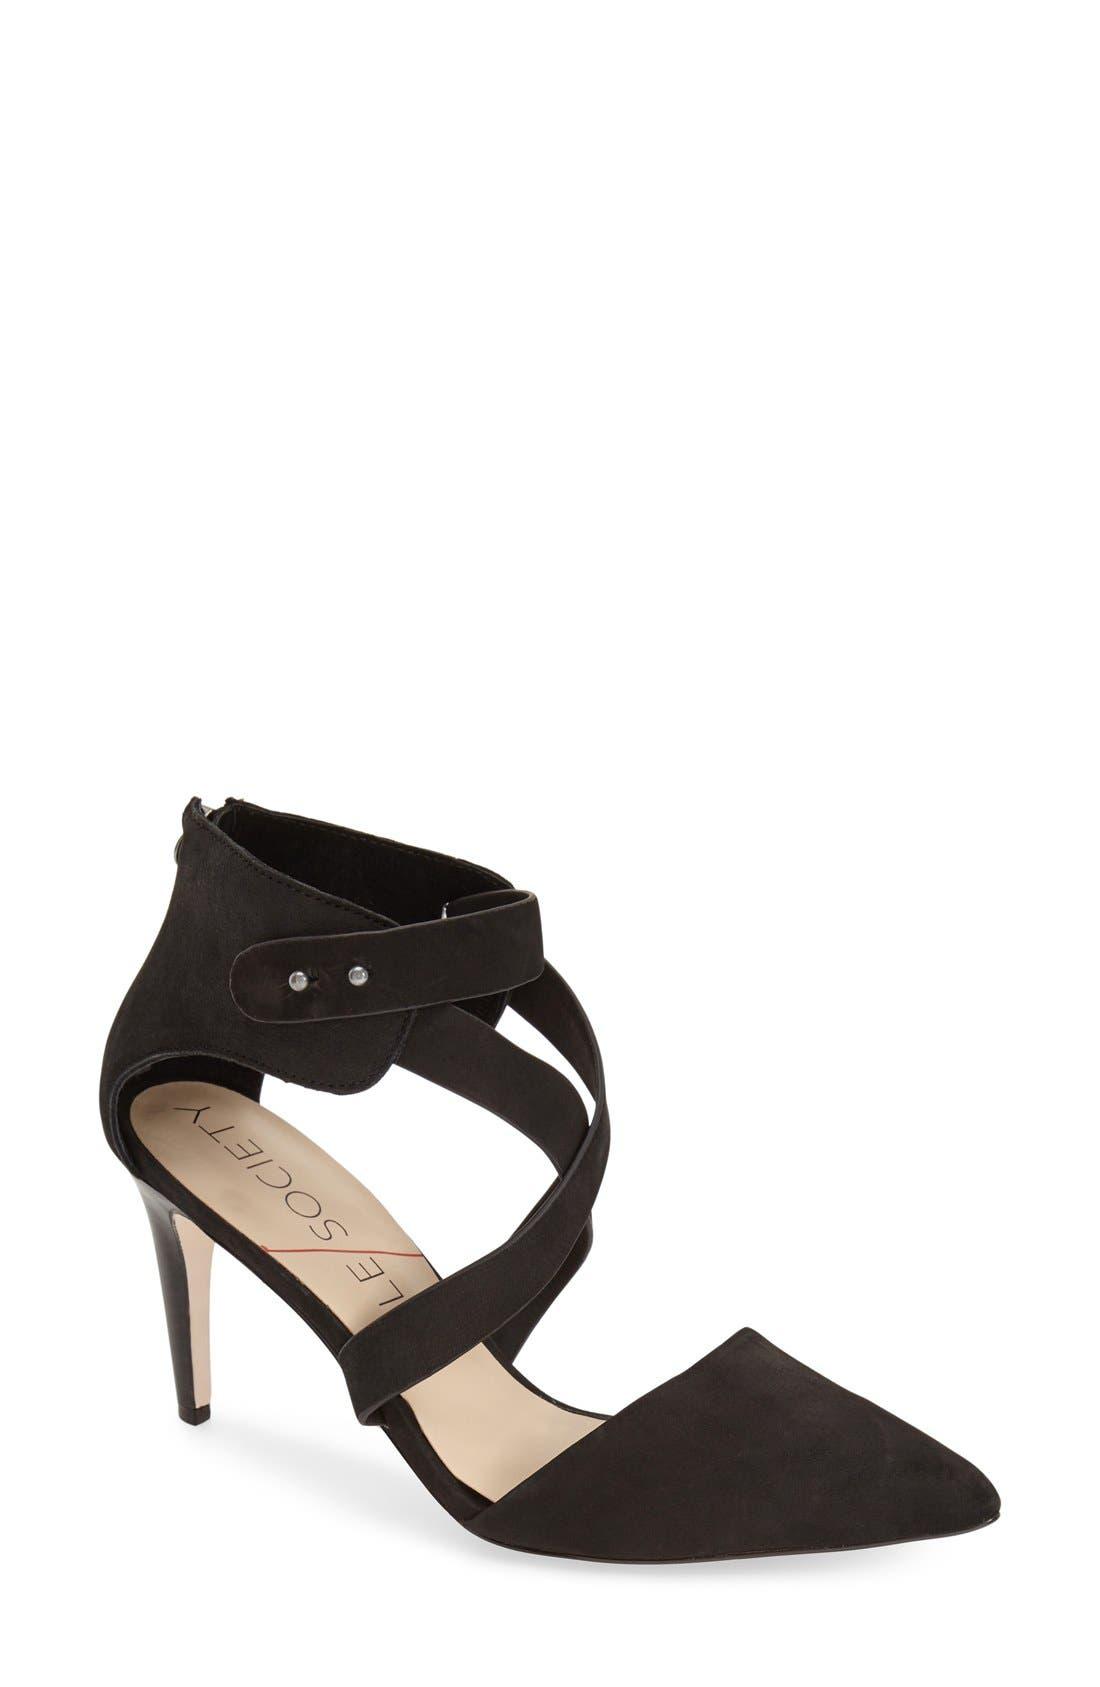 'Tina' Pump,                             Main thumbnail 1, color,                             Black Nubuck Leather